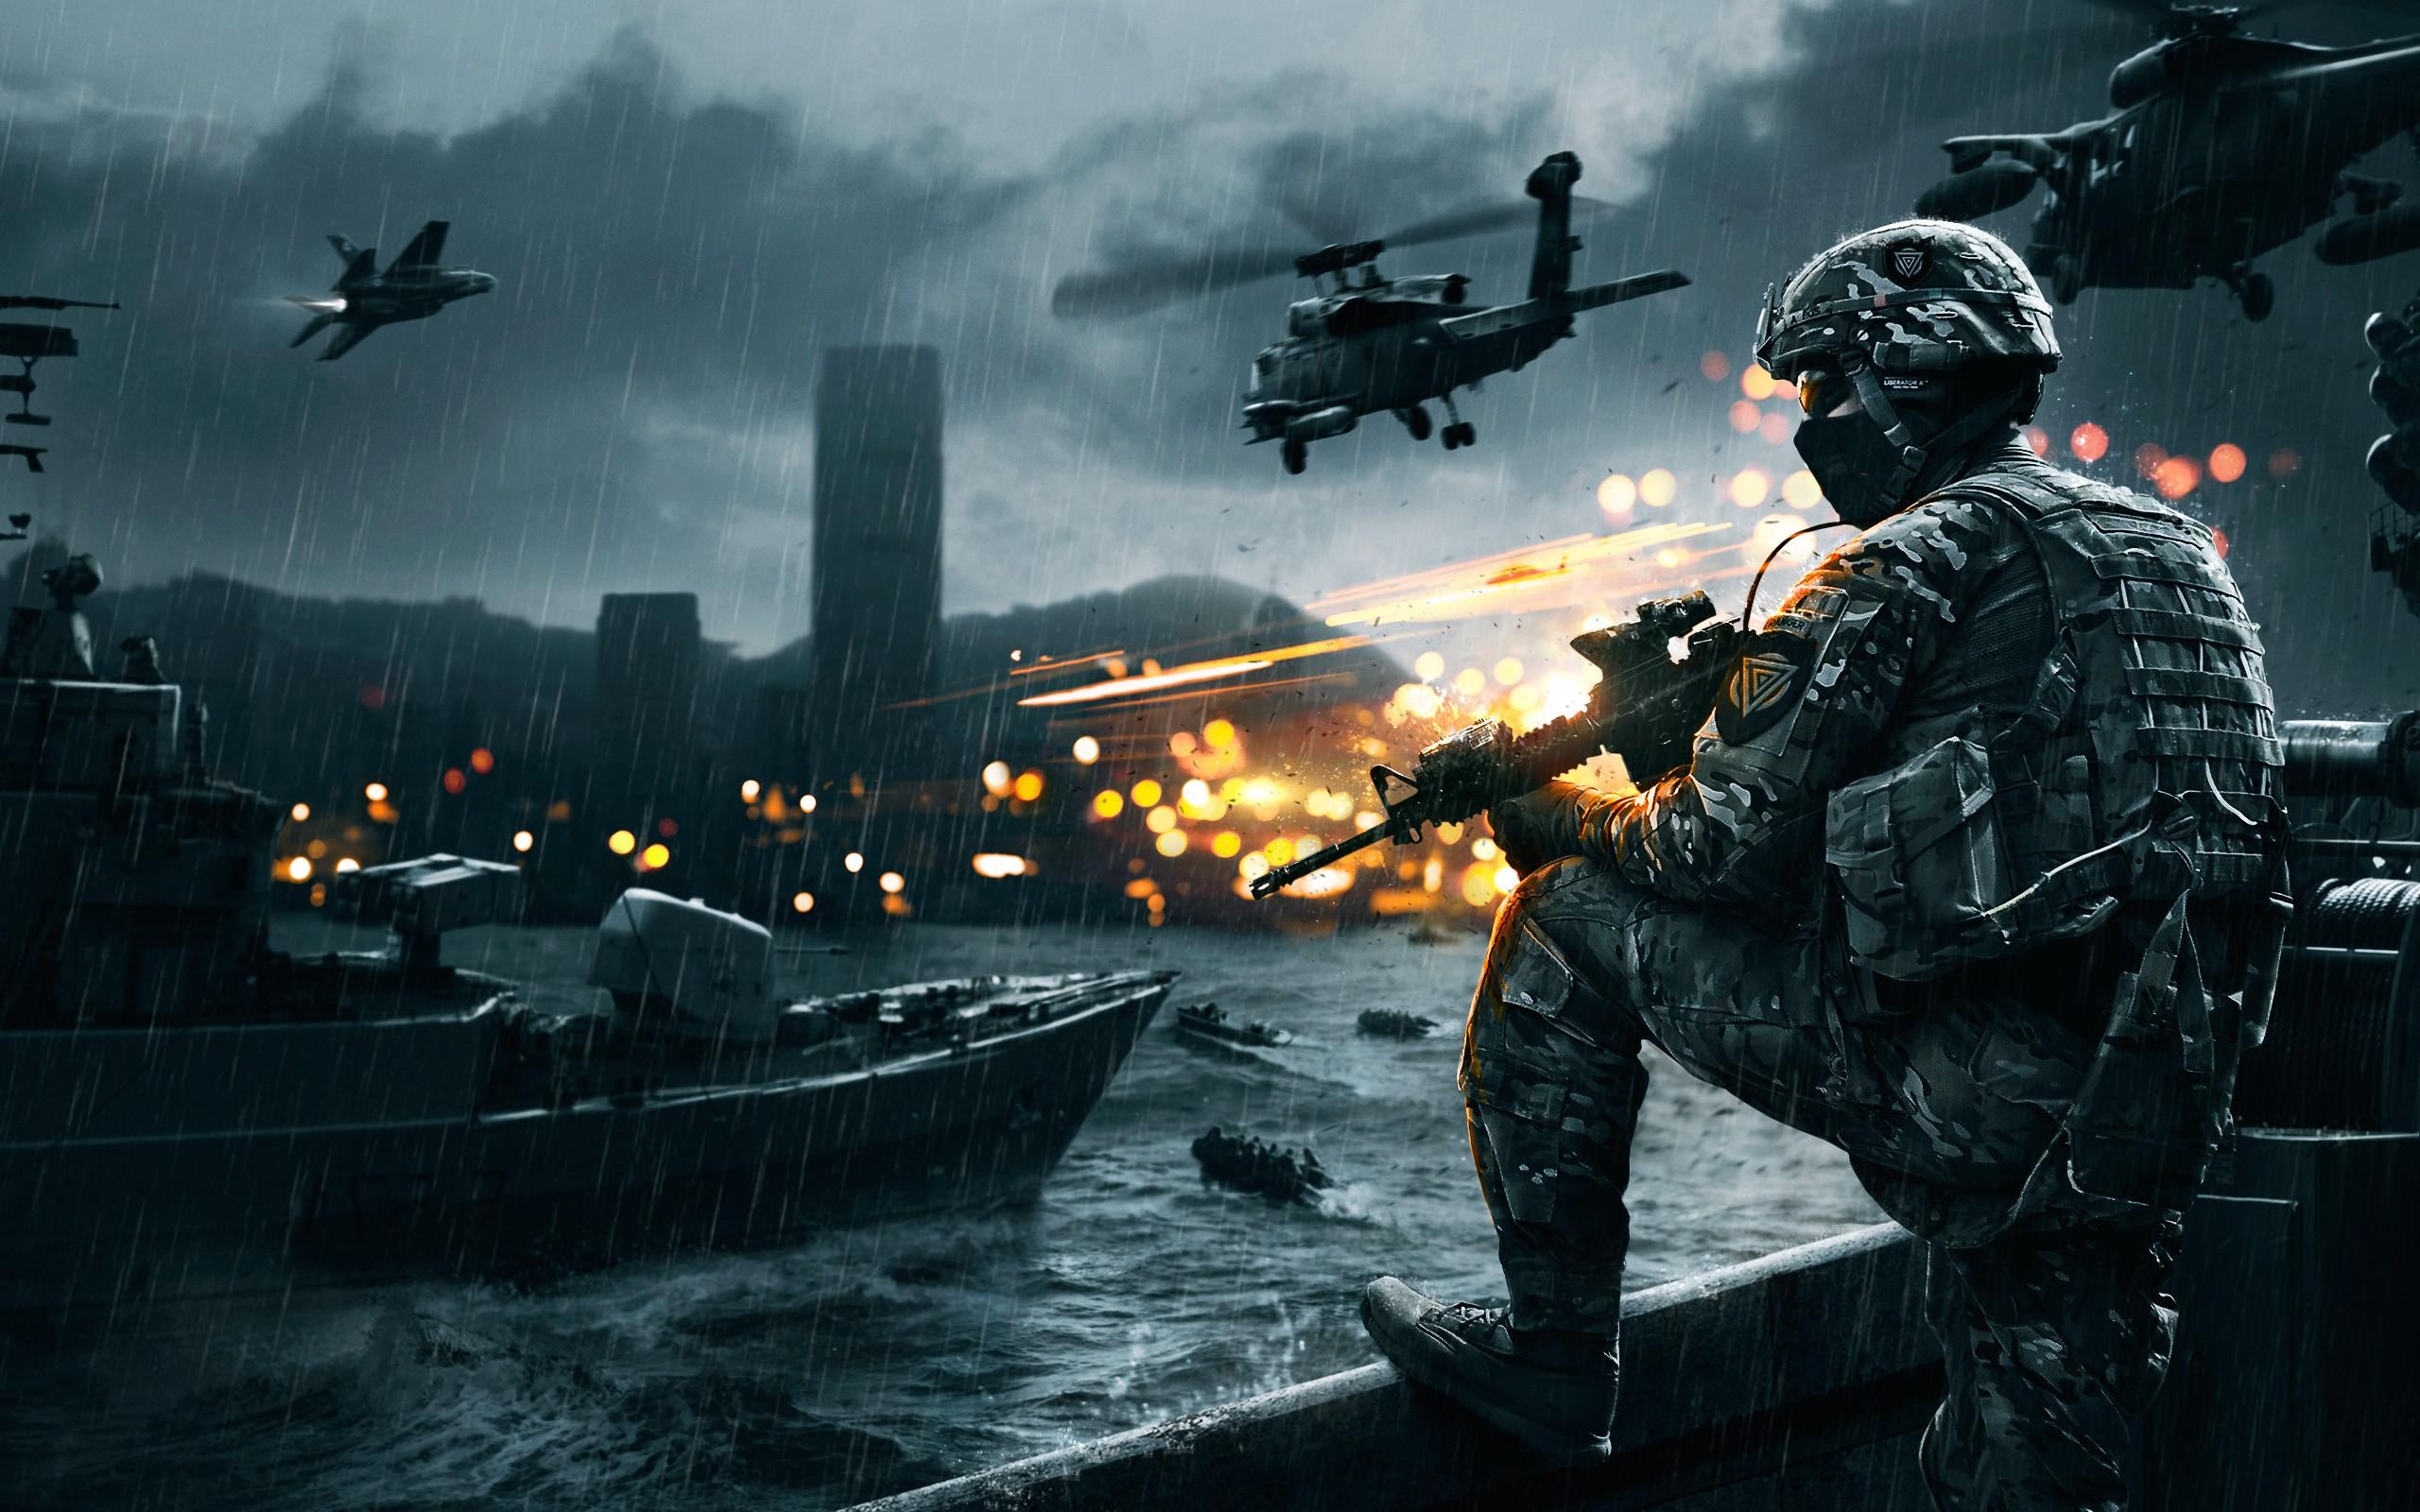 HD Wallpapers Battlefield 4 Siege of Shanghai